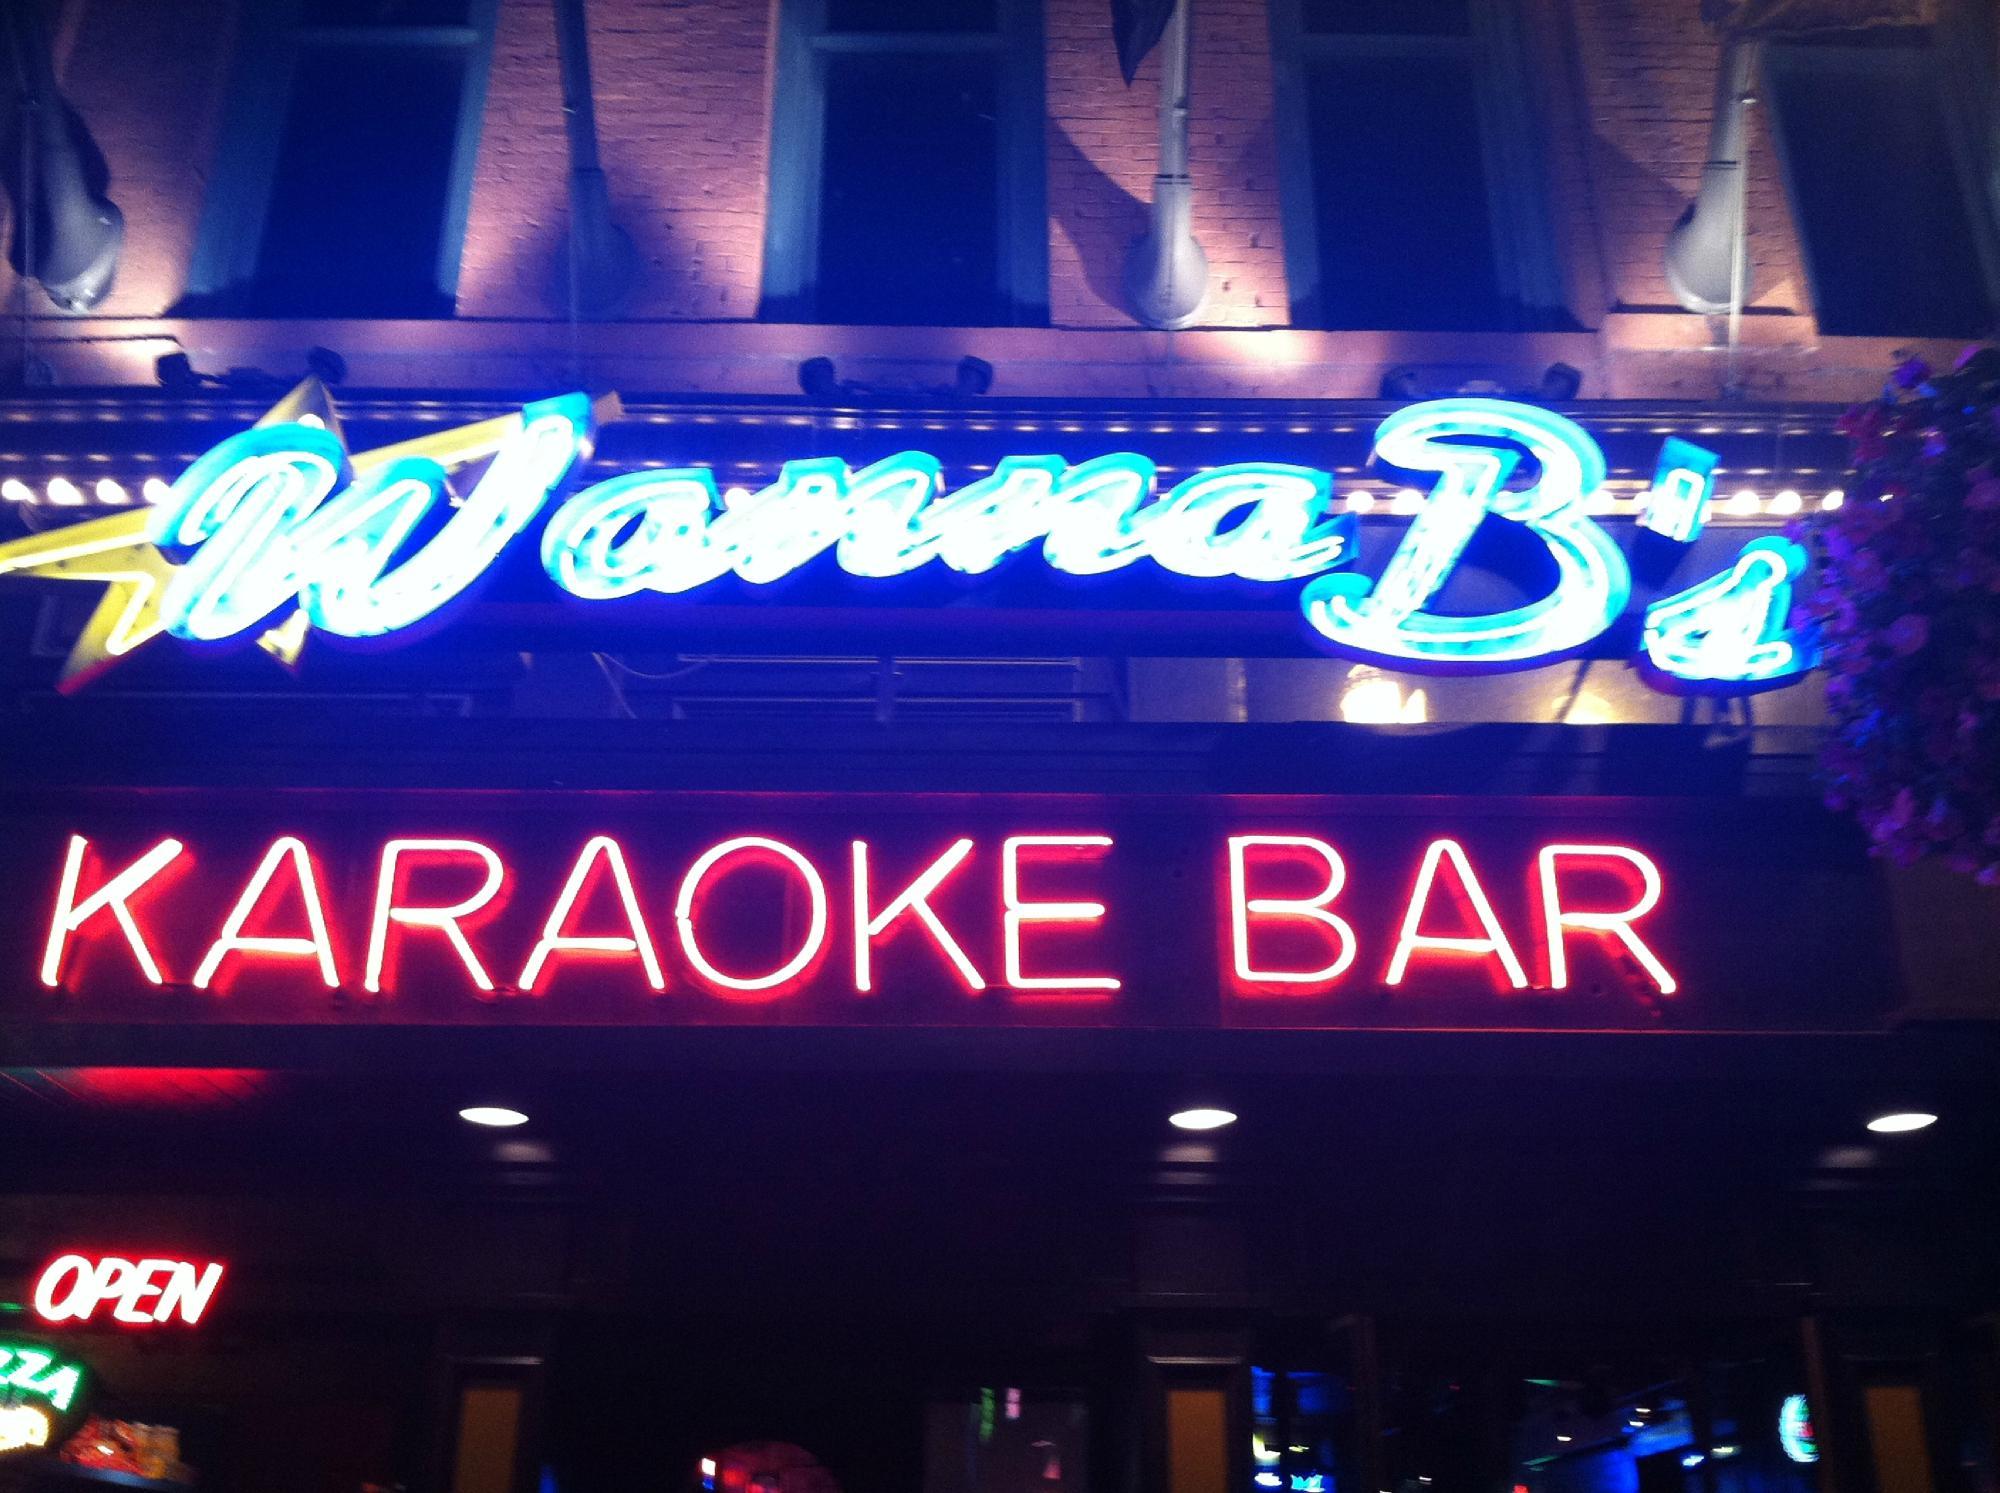 фото караоке бар